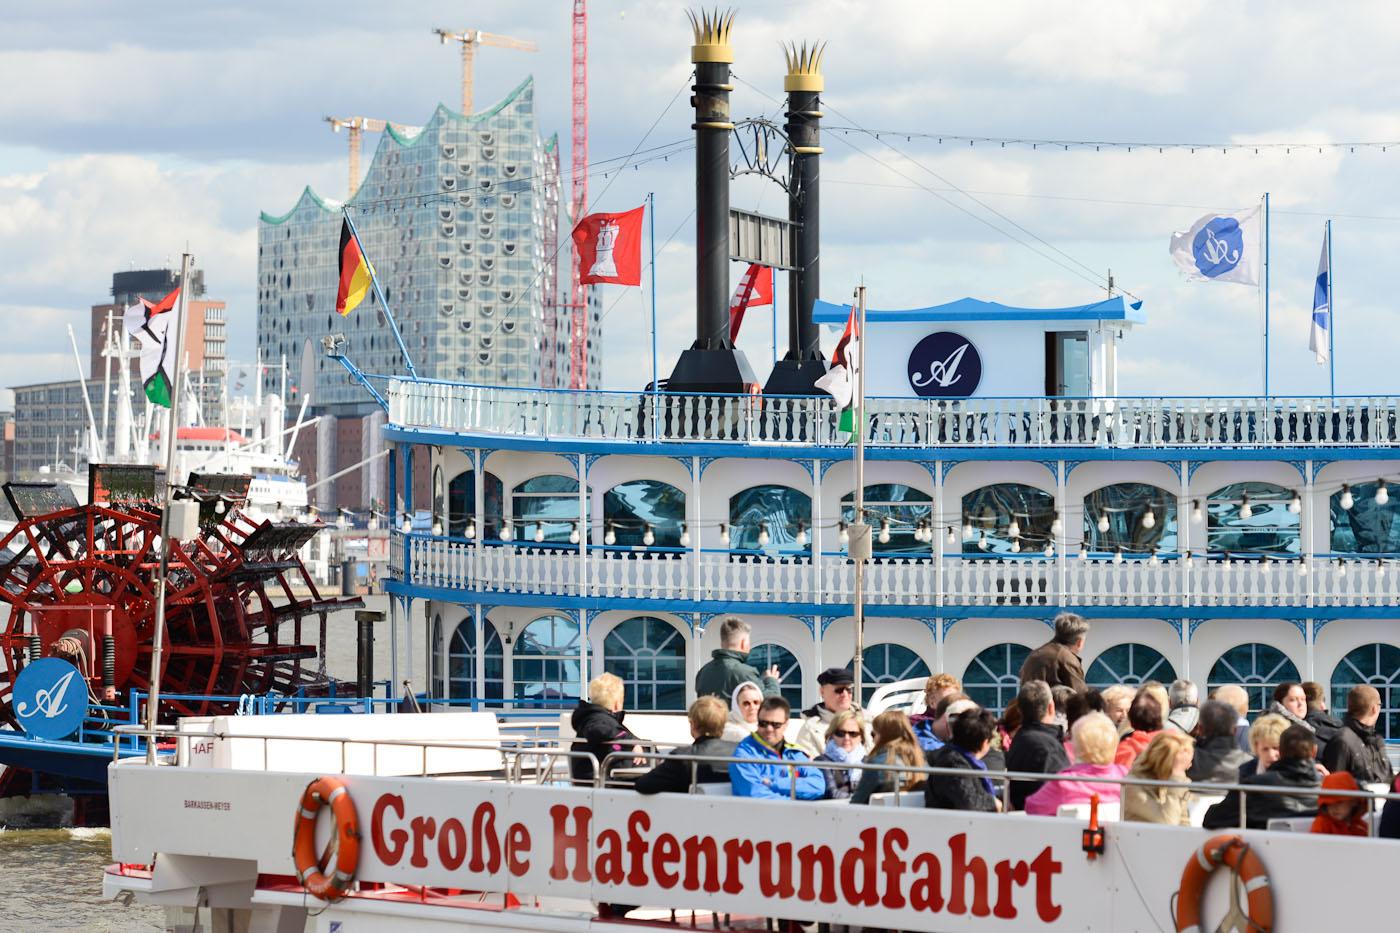 Foto ID 15042605 Lousiana Star, Hafenrundfahrt Hamburg